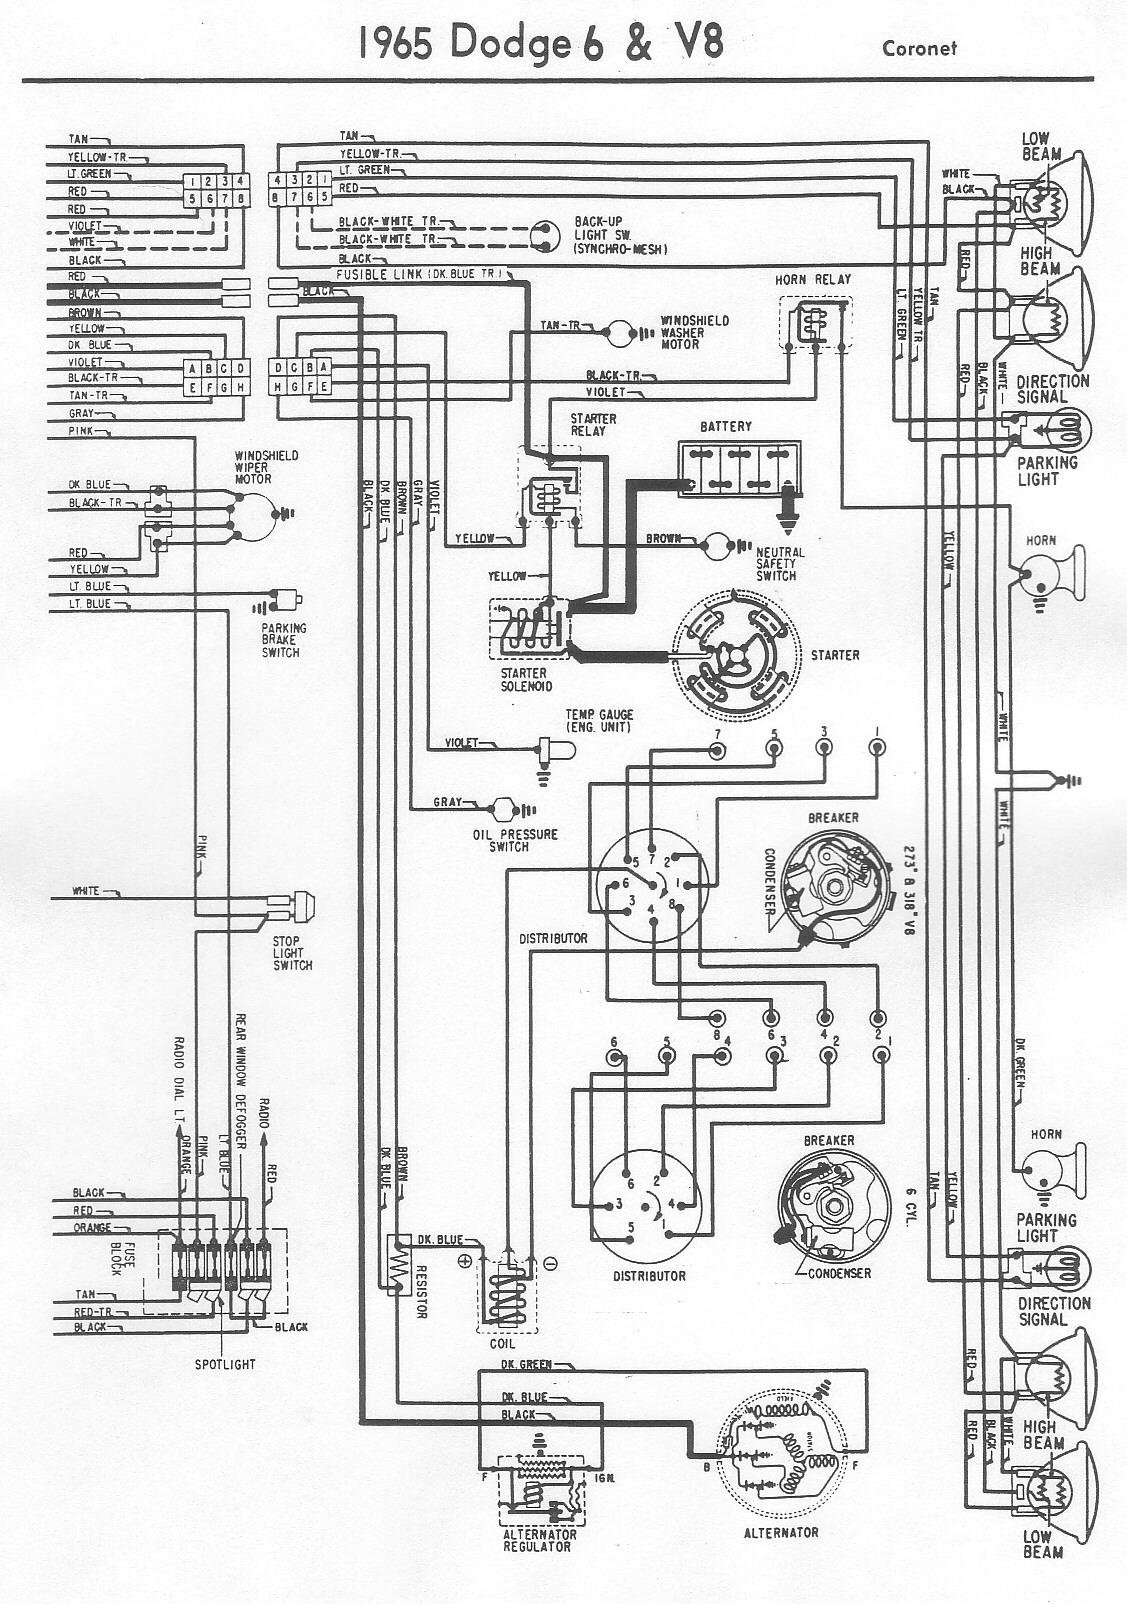 1970 Chrysler Wiring 2014 Nissan Maxima Fuse Box Diagram Plymouth Cukk Jeanjaures37 Fr